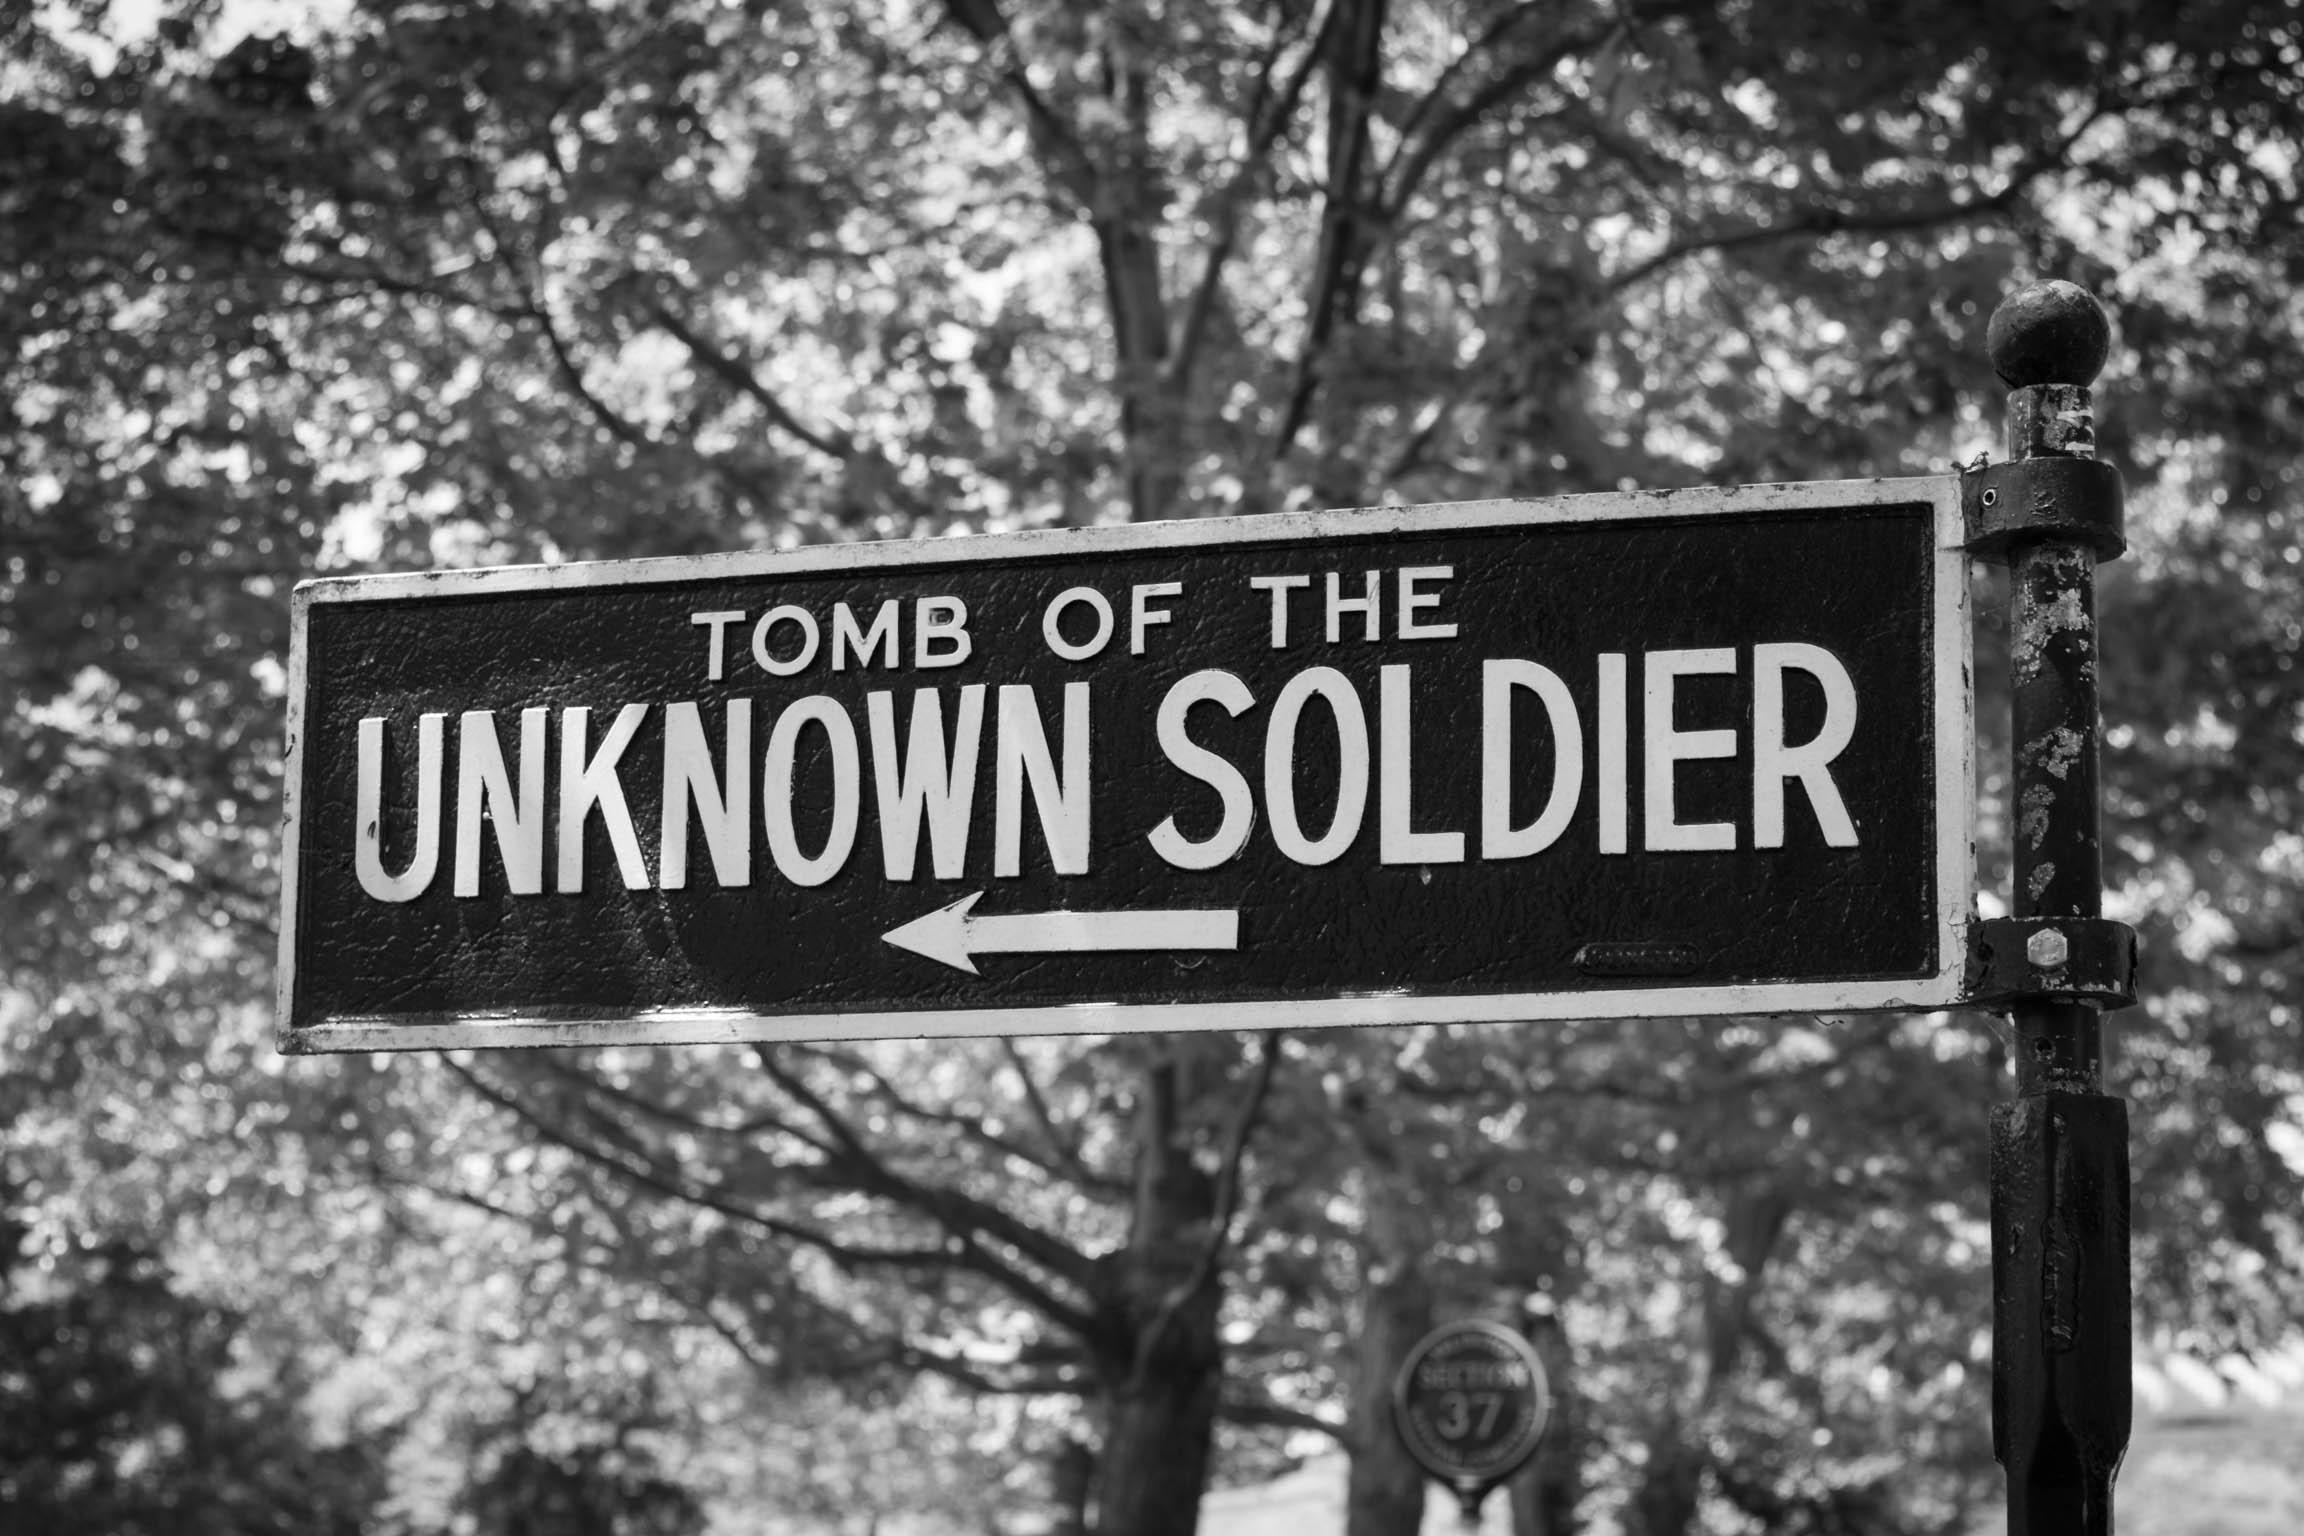 Vers la tombe du soldat inconnu